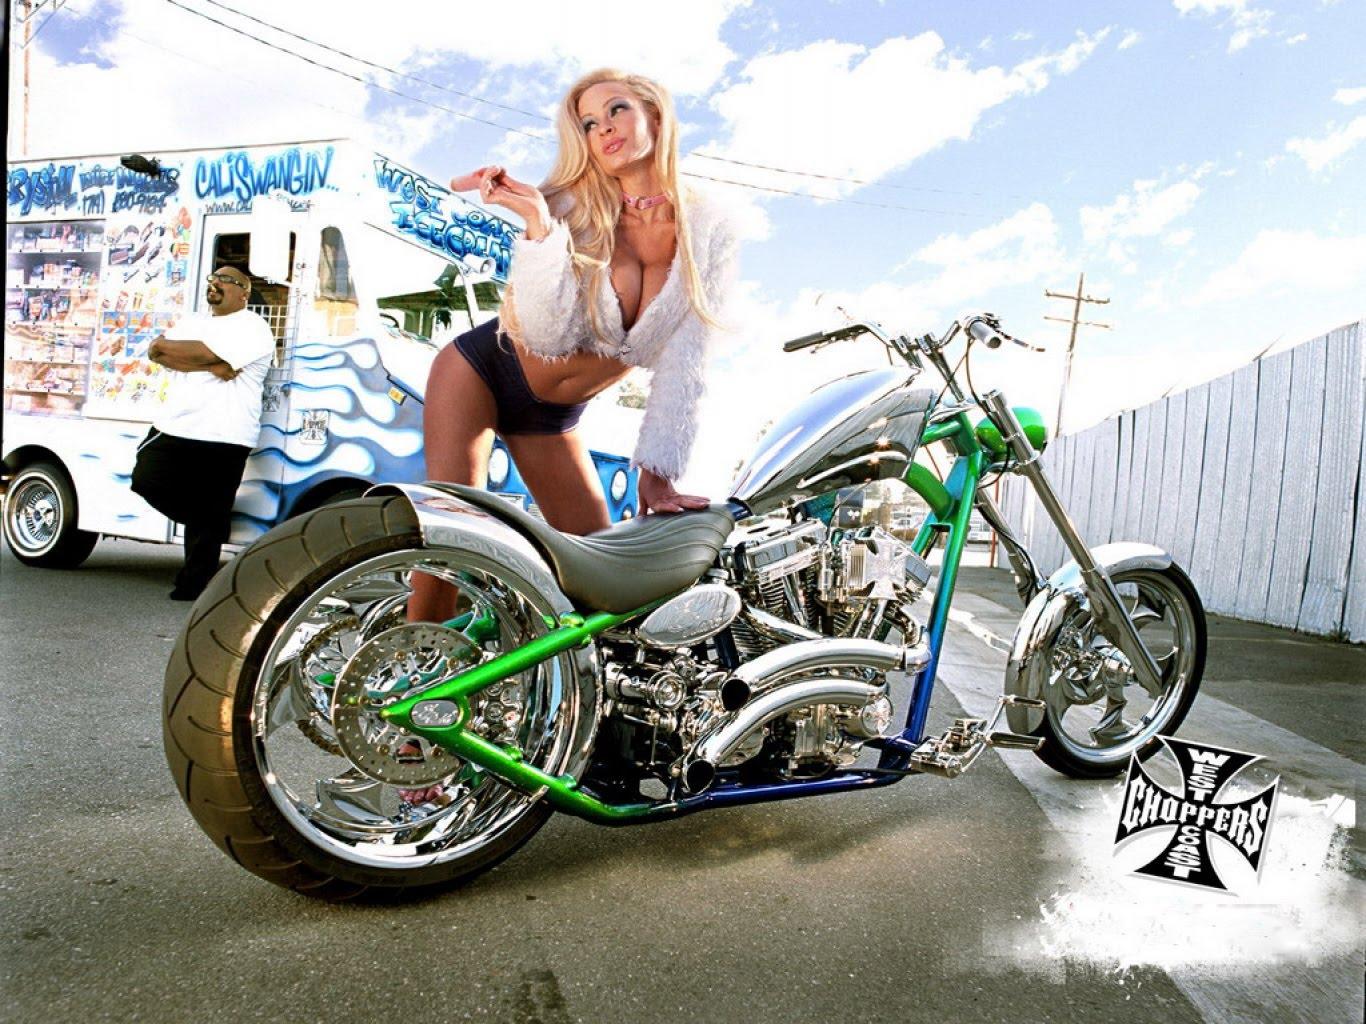 http://4.bp.blogspot.com/-ne-AozJjIKo/TaY3xWWeXHI/AAAAAAAAAAQ/iH407BOzWK0/s1600/12-1+Wallpapers+de+moto+chopera+rubia.jpg